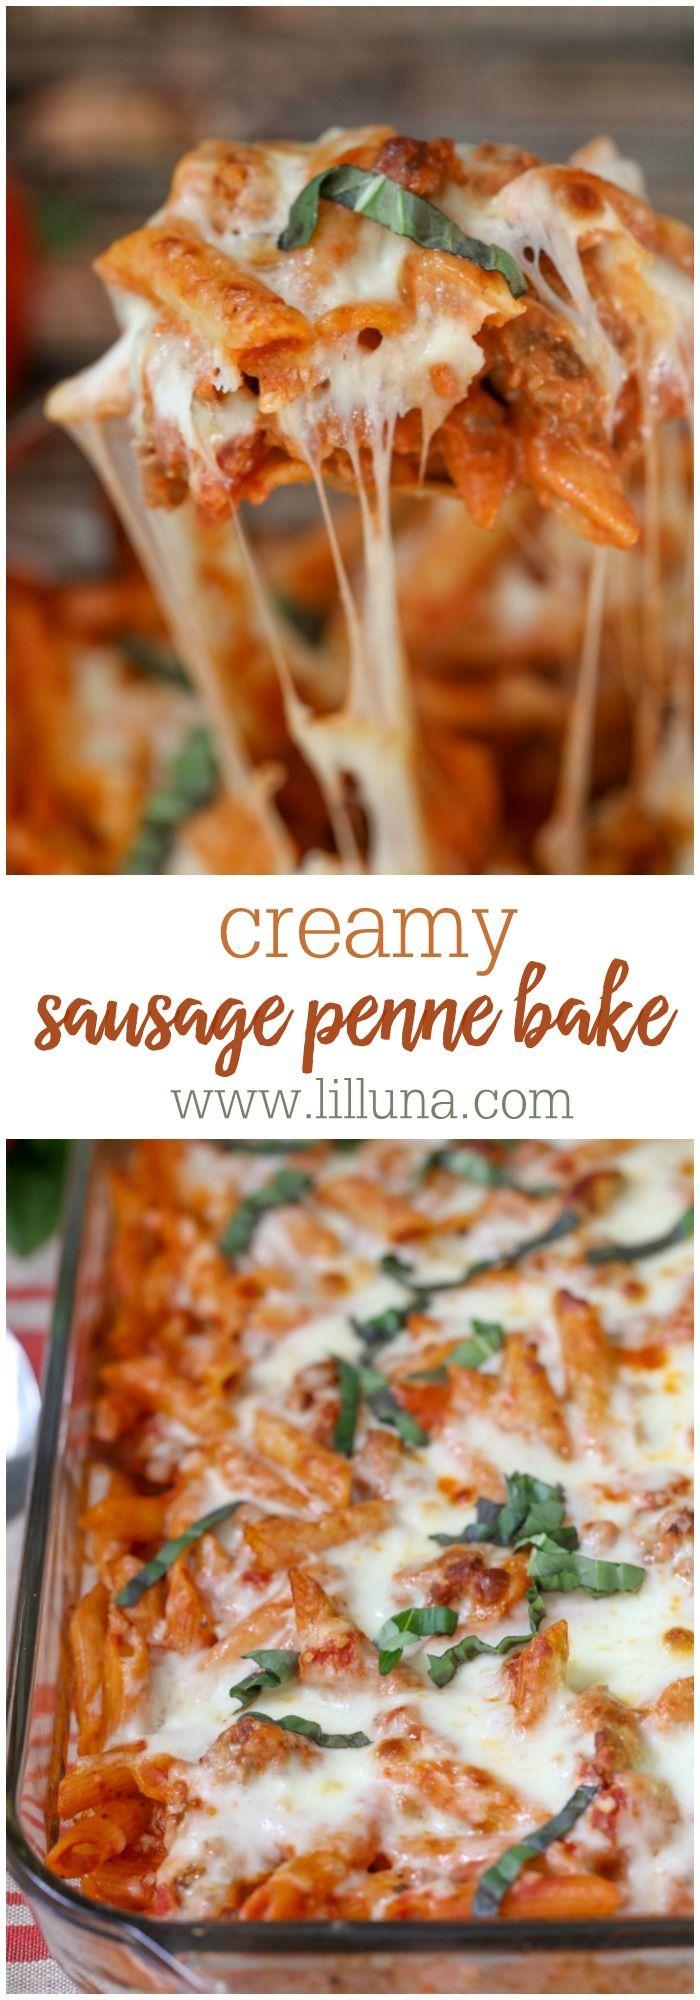 Creamy Sausage Penne Bake #porksausages